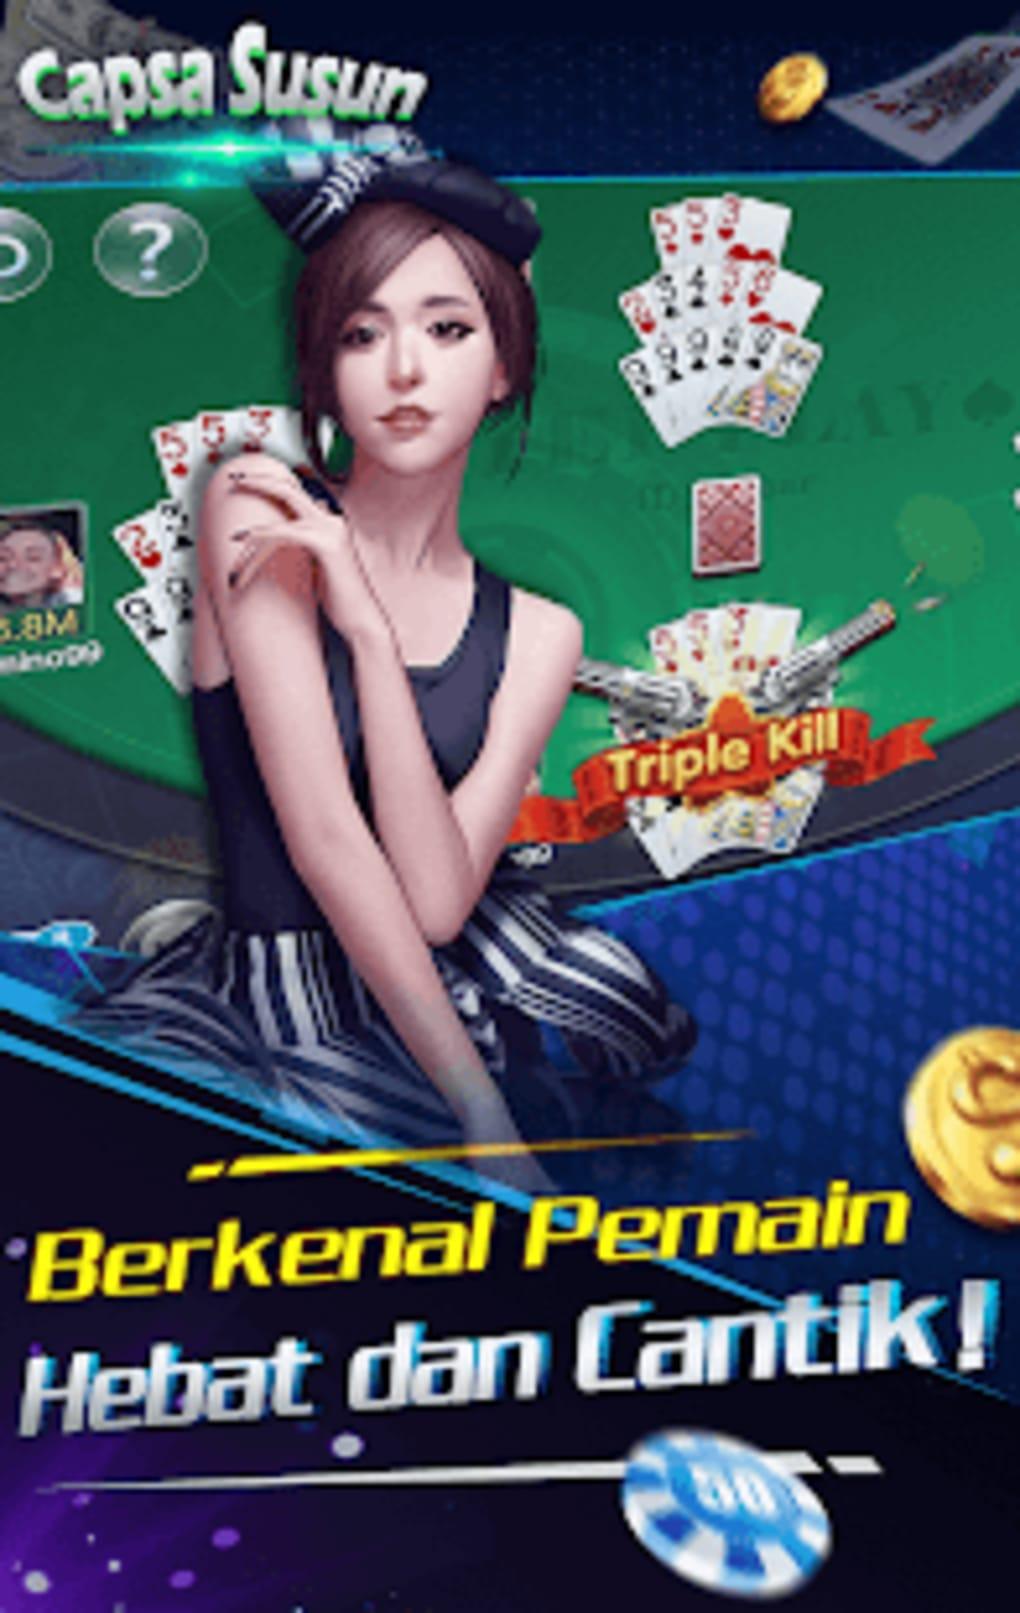 Capsa Susun bonus pulsa free poker remi online untuk